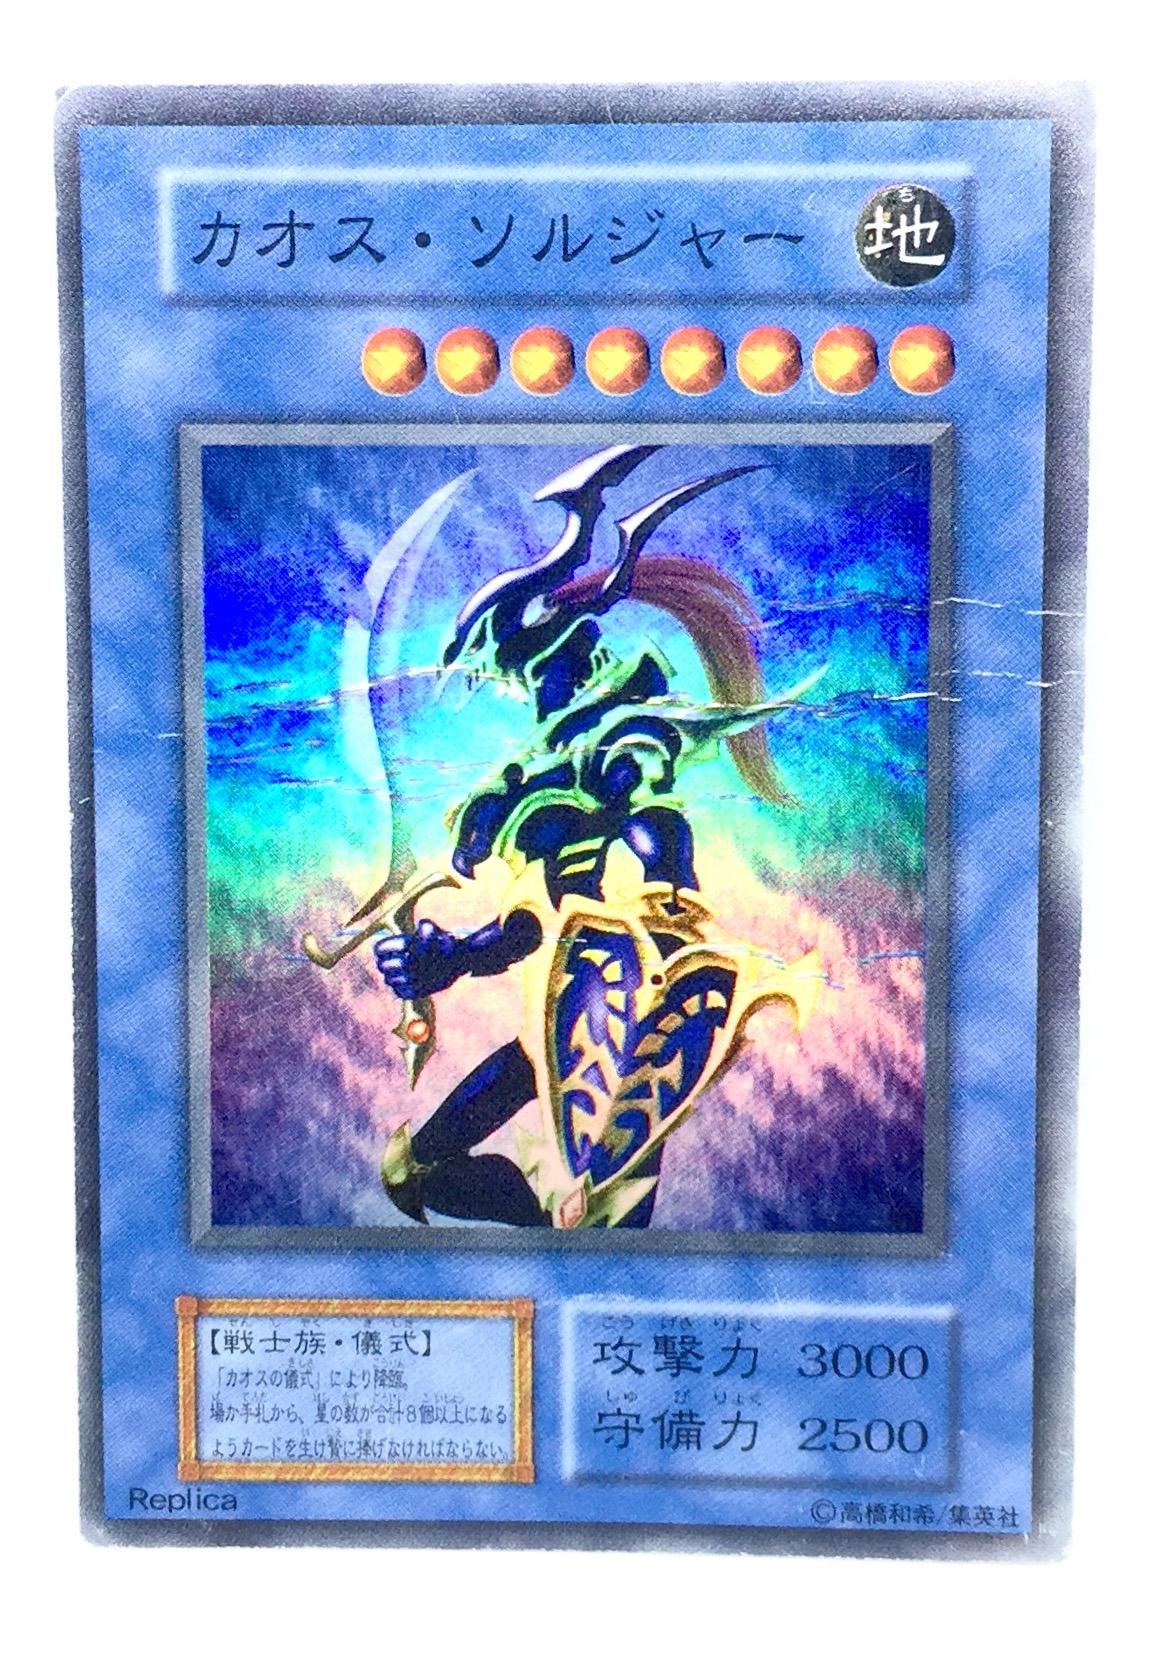 Yu-Gi-Oh Black Luster Soldier